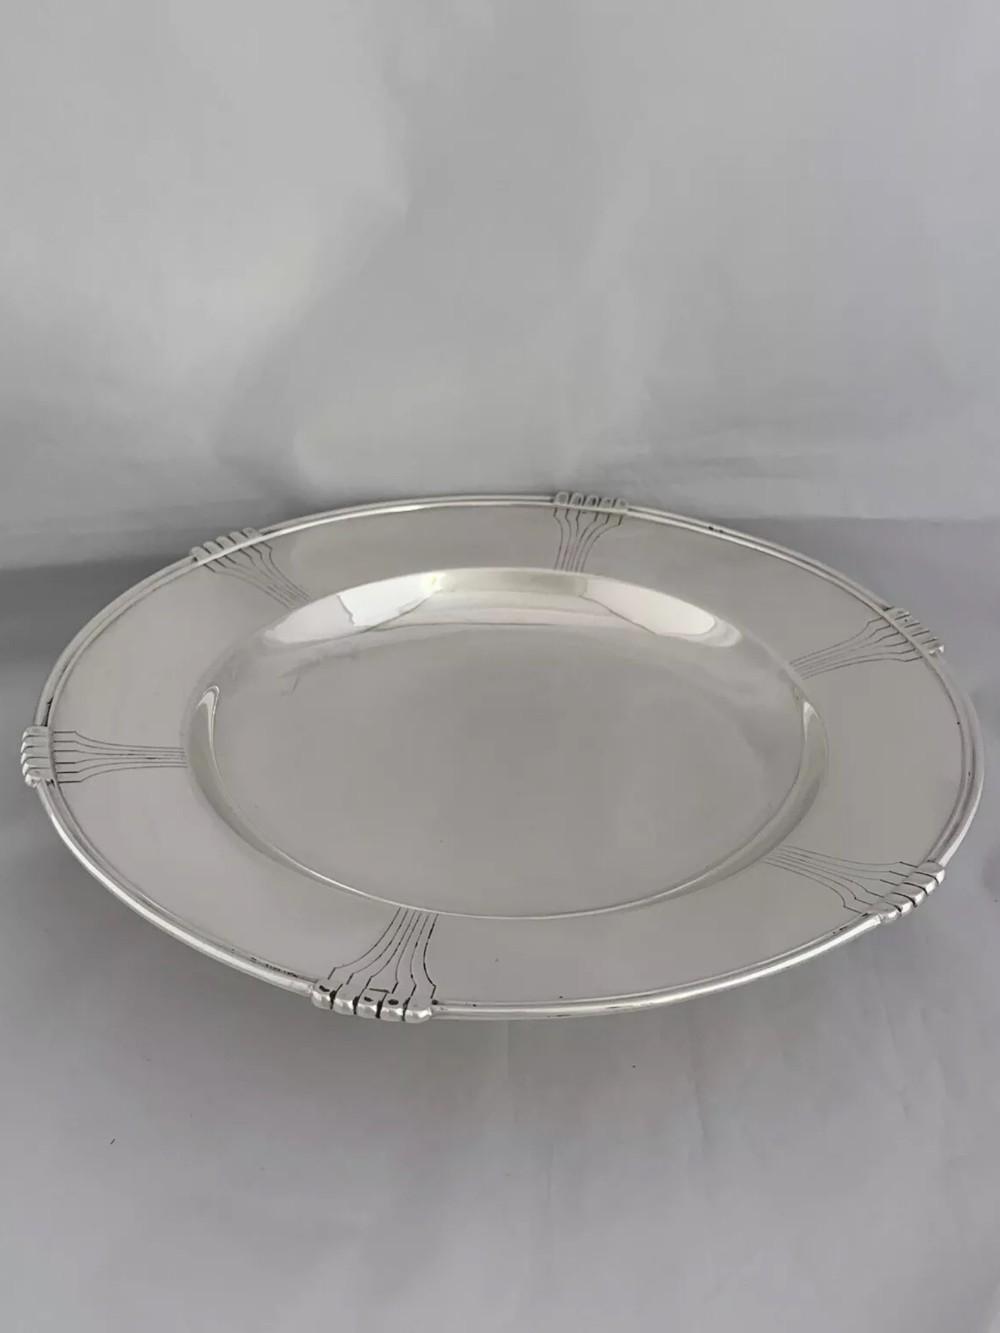 large solid silver art deco pedestal dish 1938 sheffield mappin webb